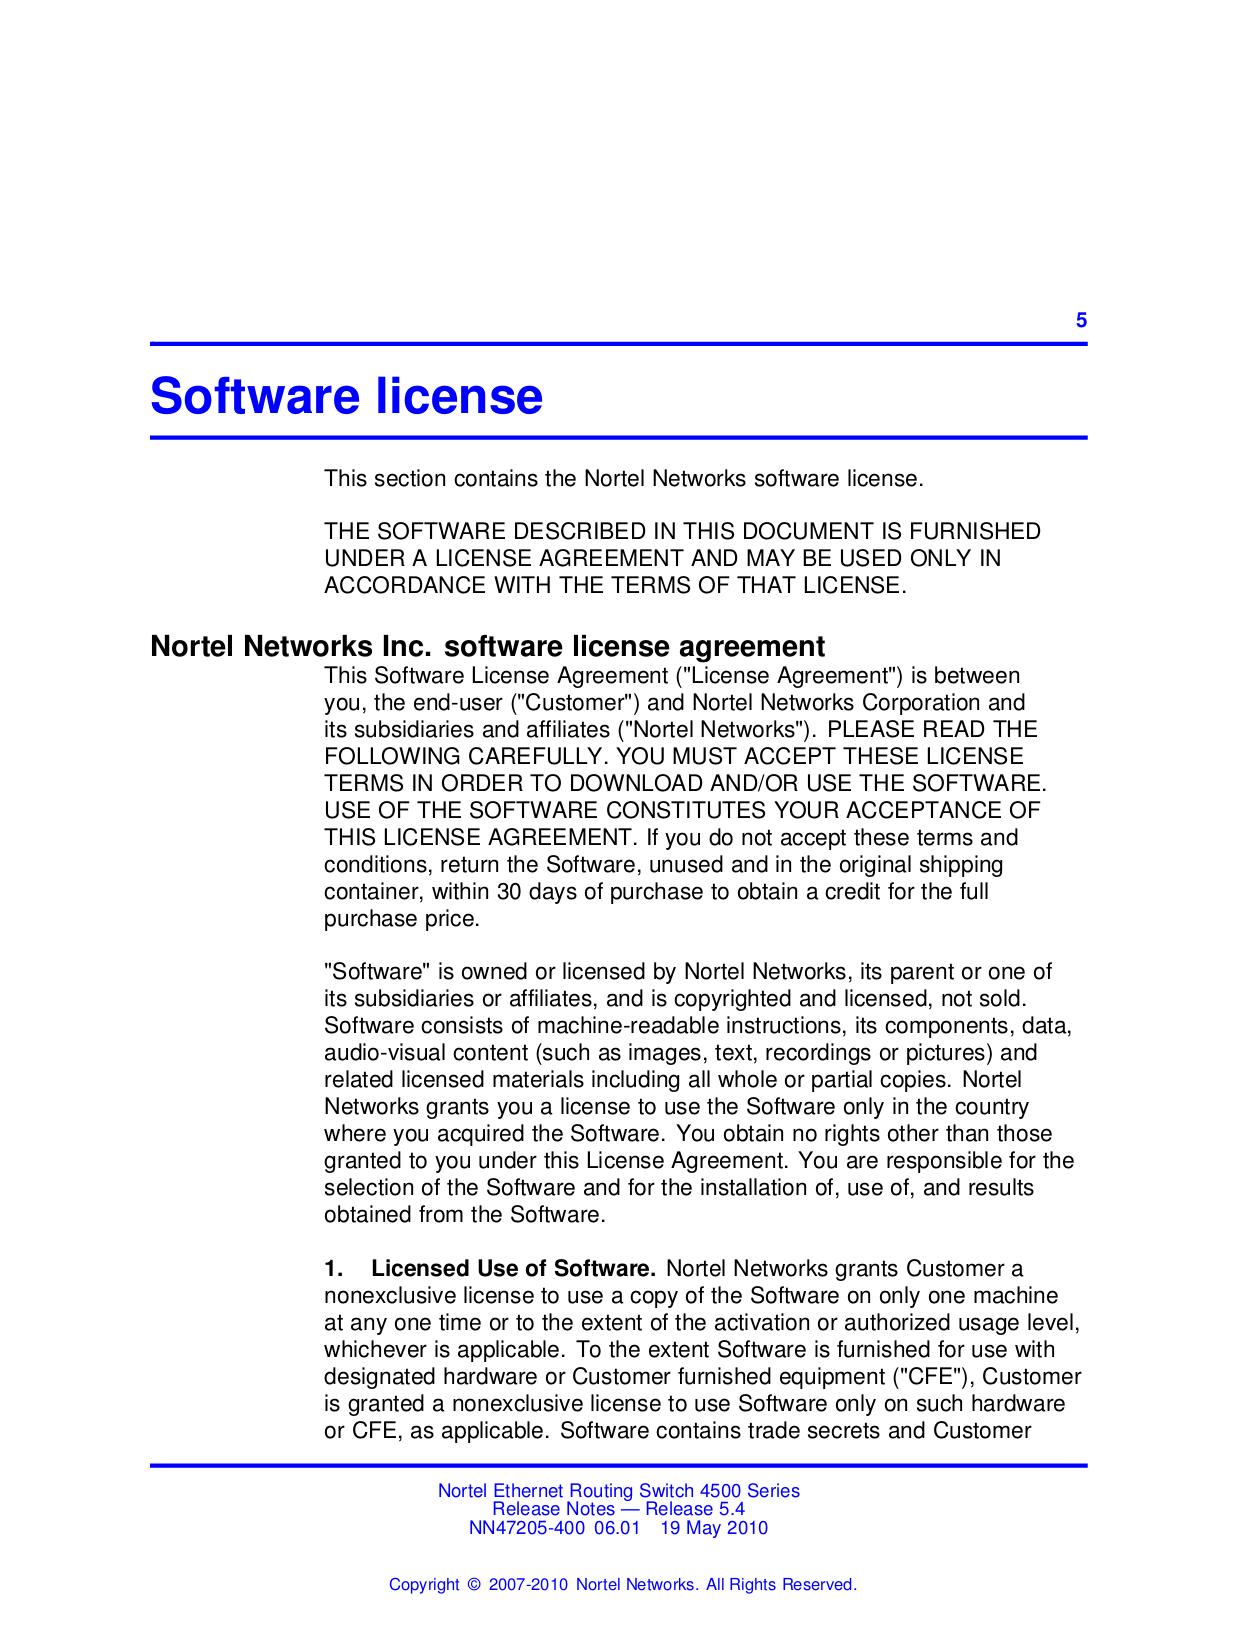 Nortel Router Contivity 1000 GT pdf page preview